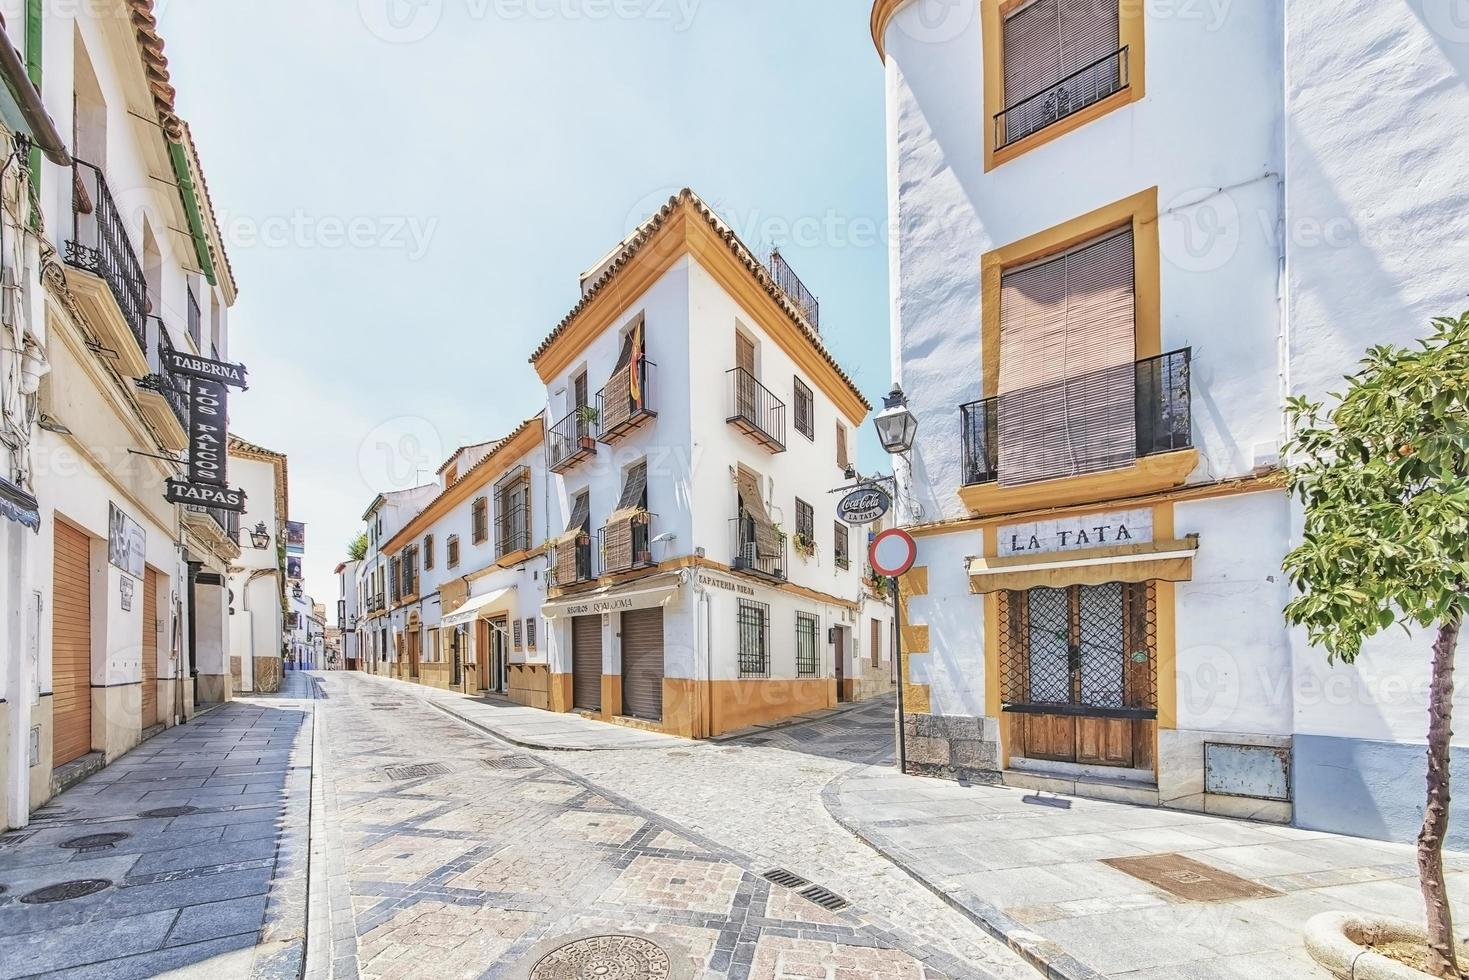 Cordoba city in the daytime photo